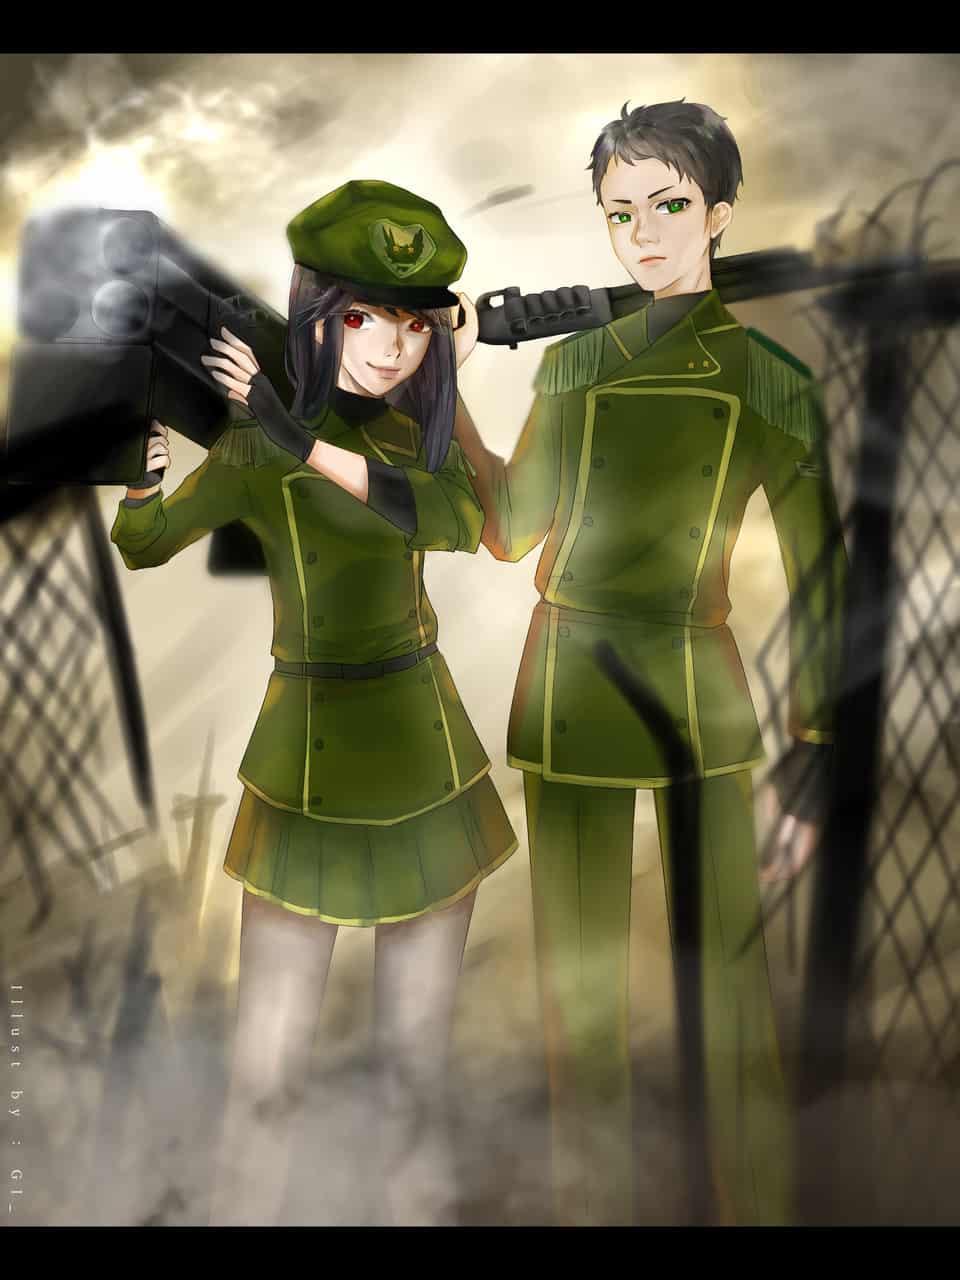 Fantasy Military/Army Uniform #HumanAcademy_2019